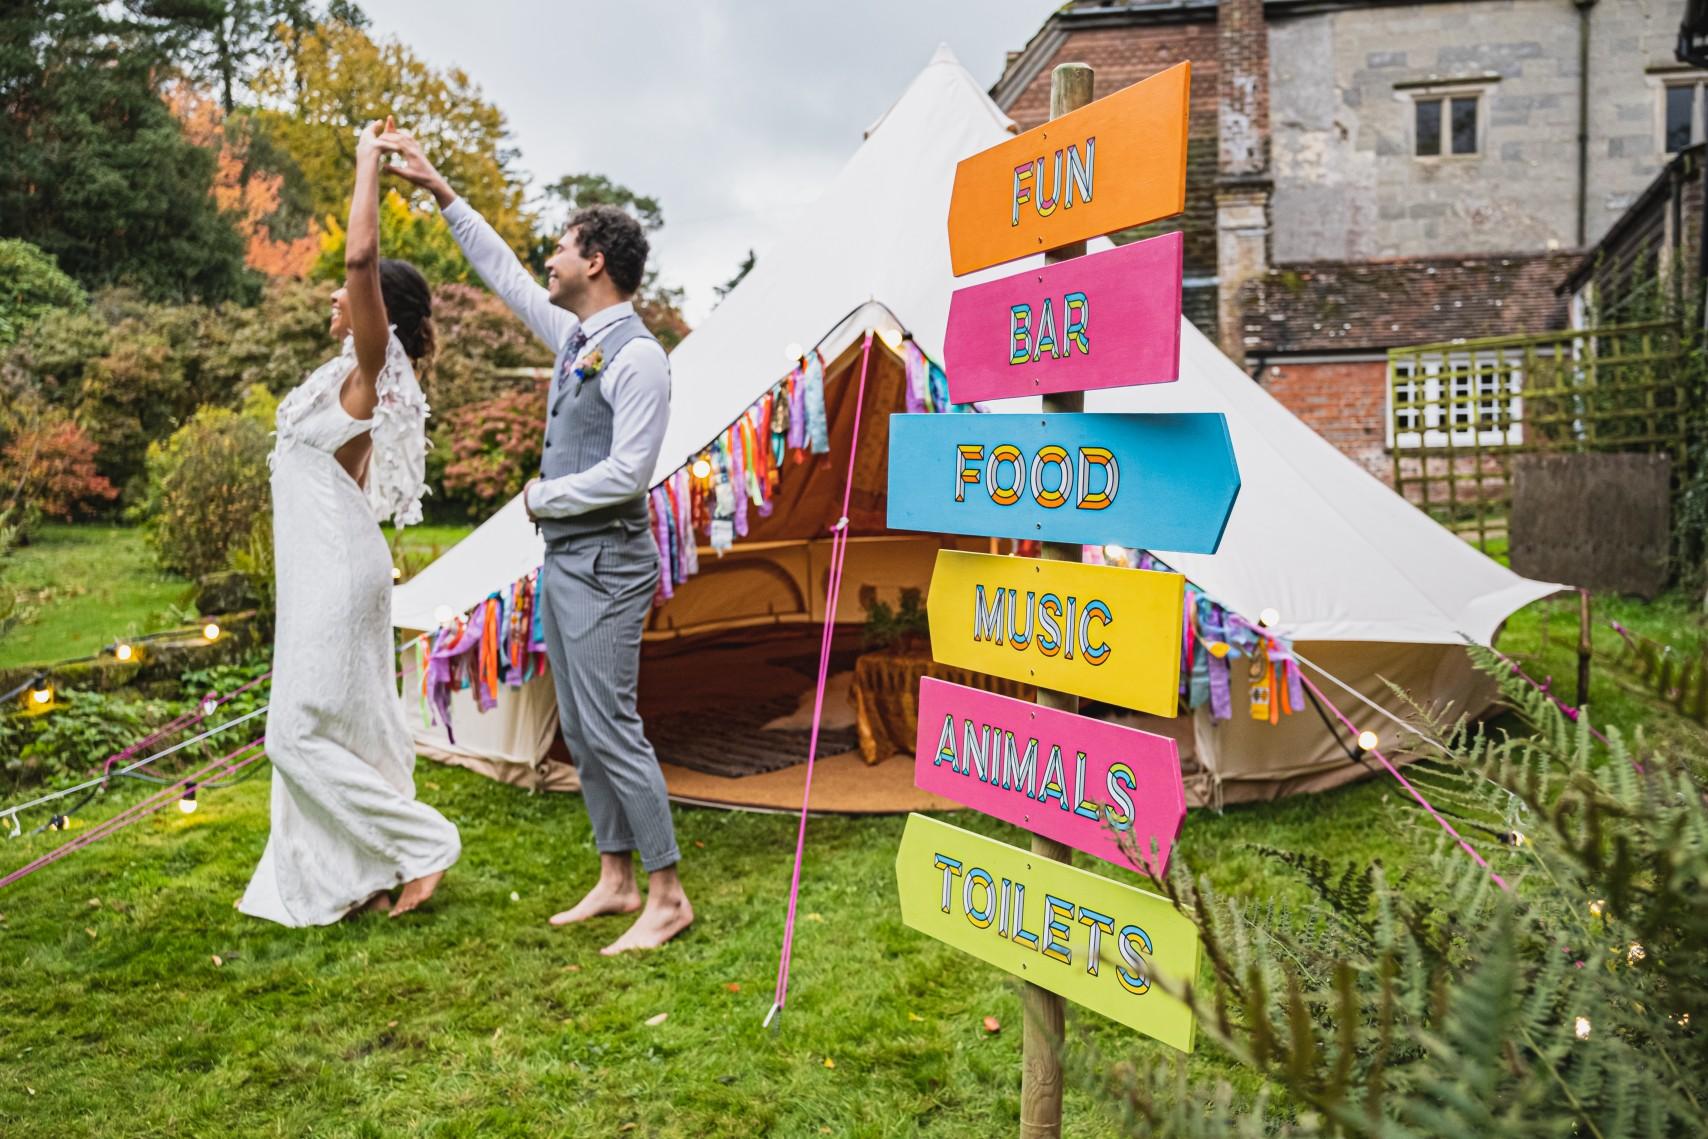 colourful micro wedding at patricks barn - bride and groom dancing - festival wedding - colourful wedding - bell tent wedding